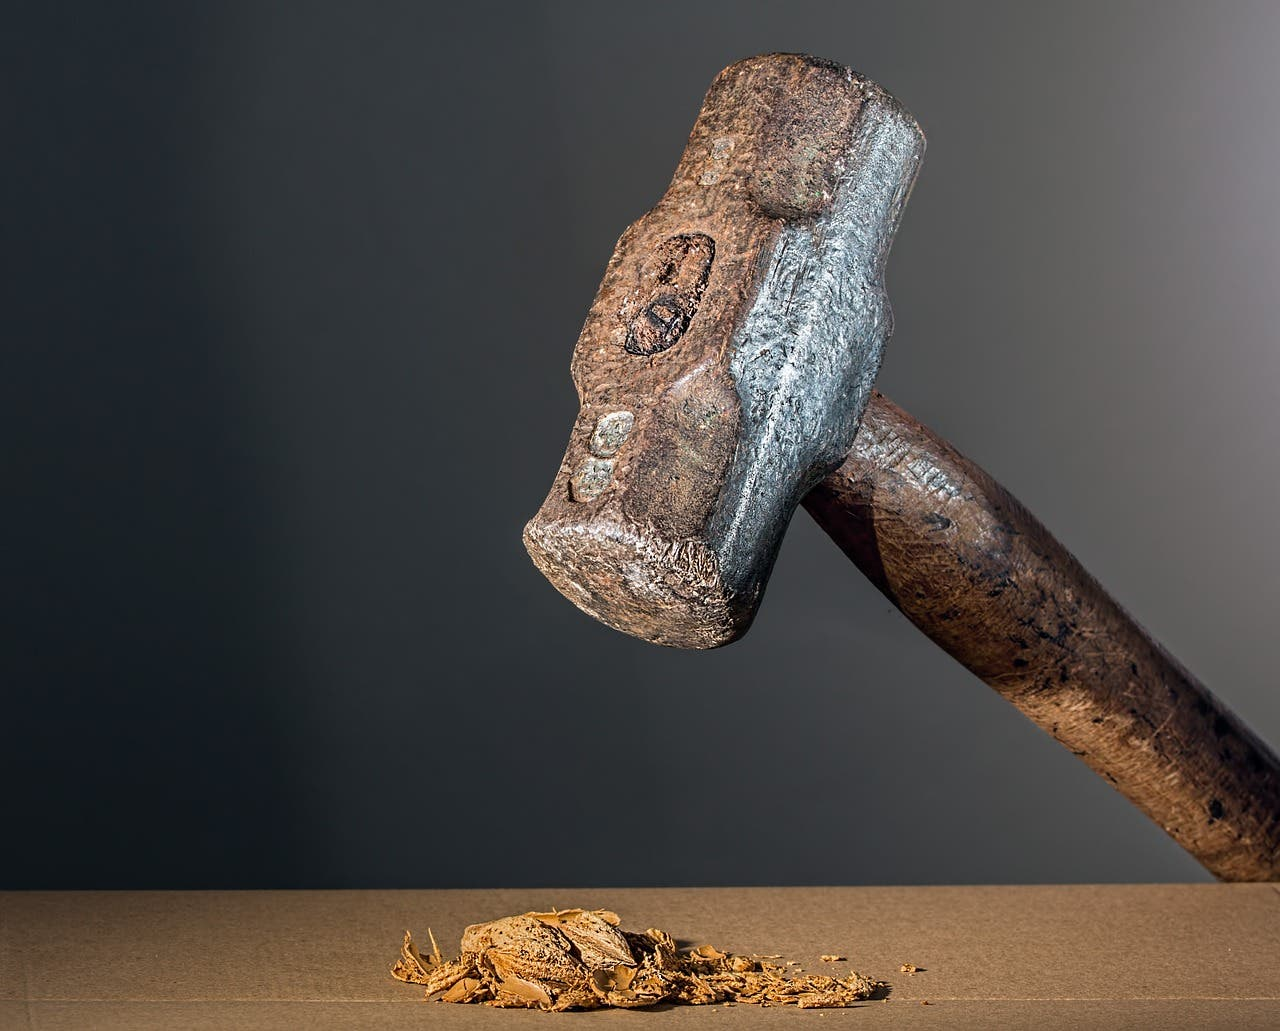 Muere la anciana a la que su viejo marido reventó la cabeza con un martillo